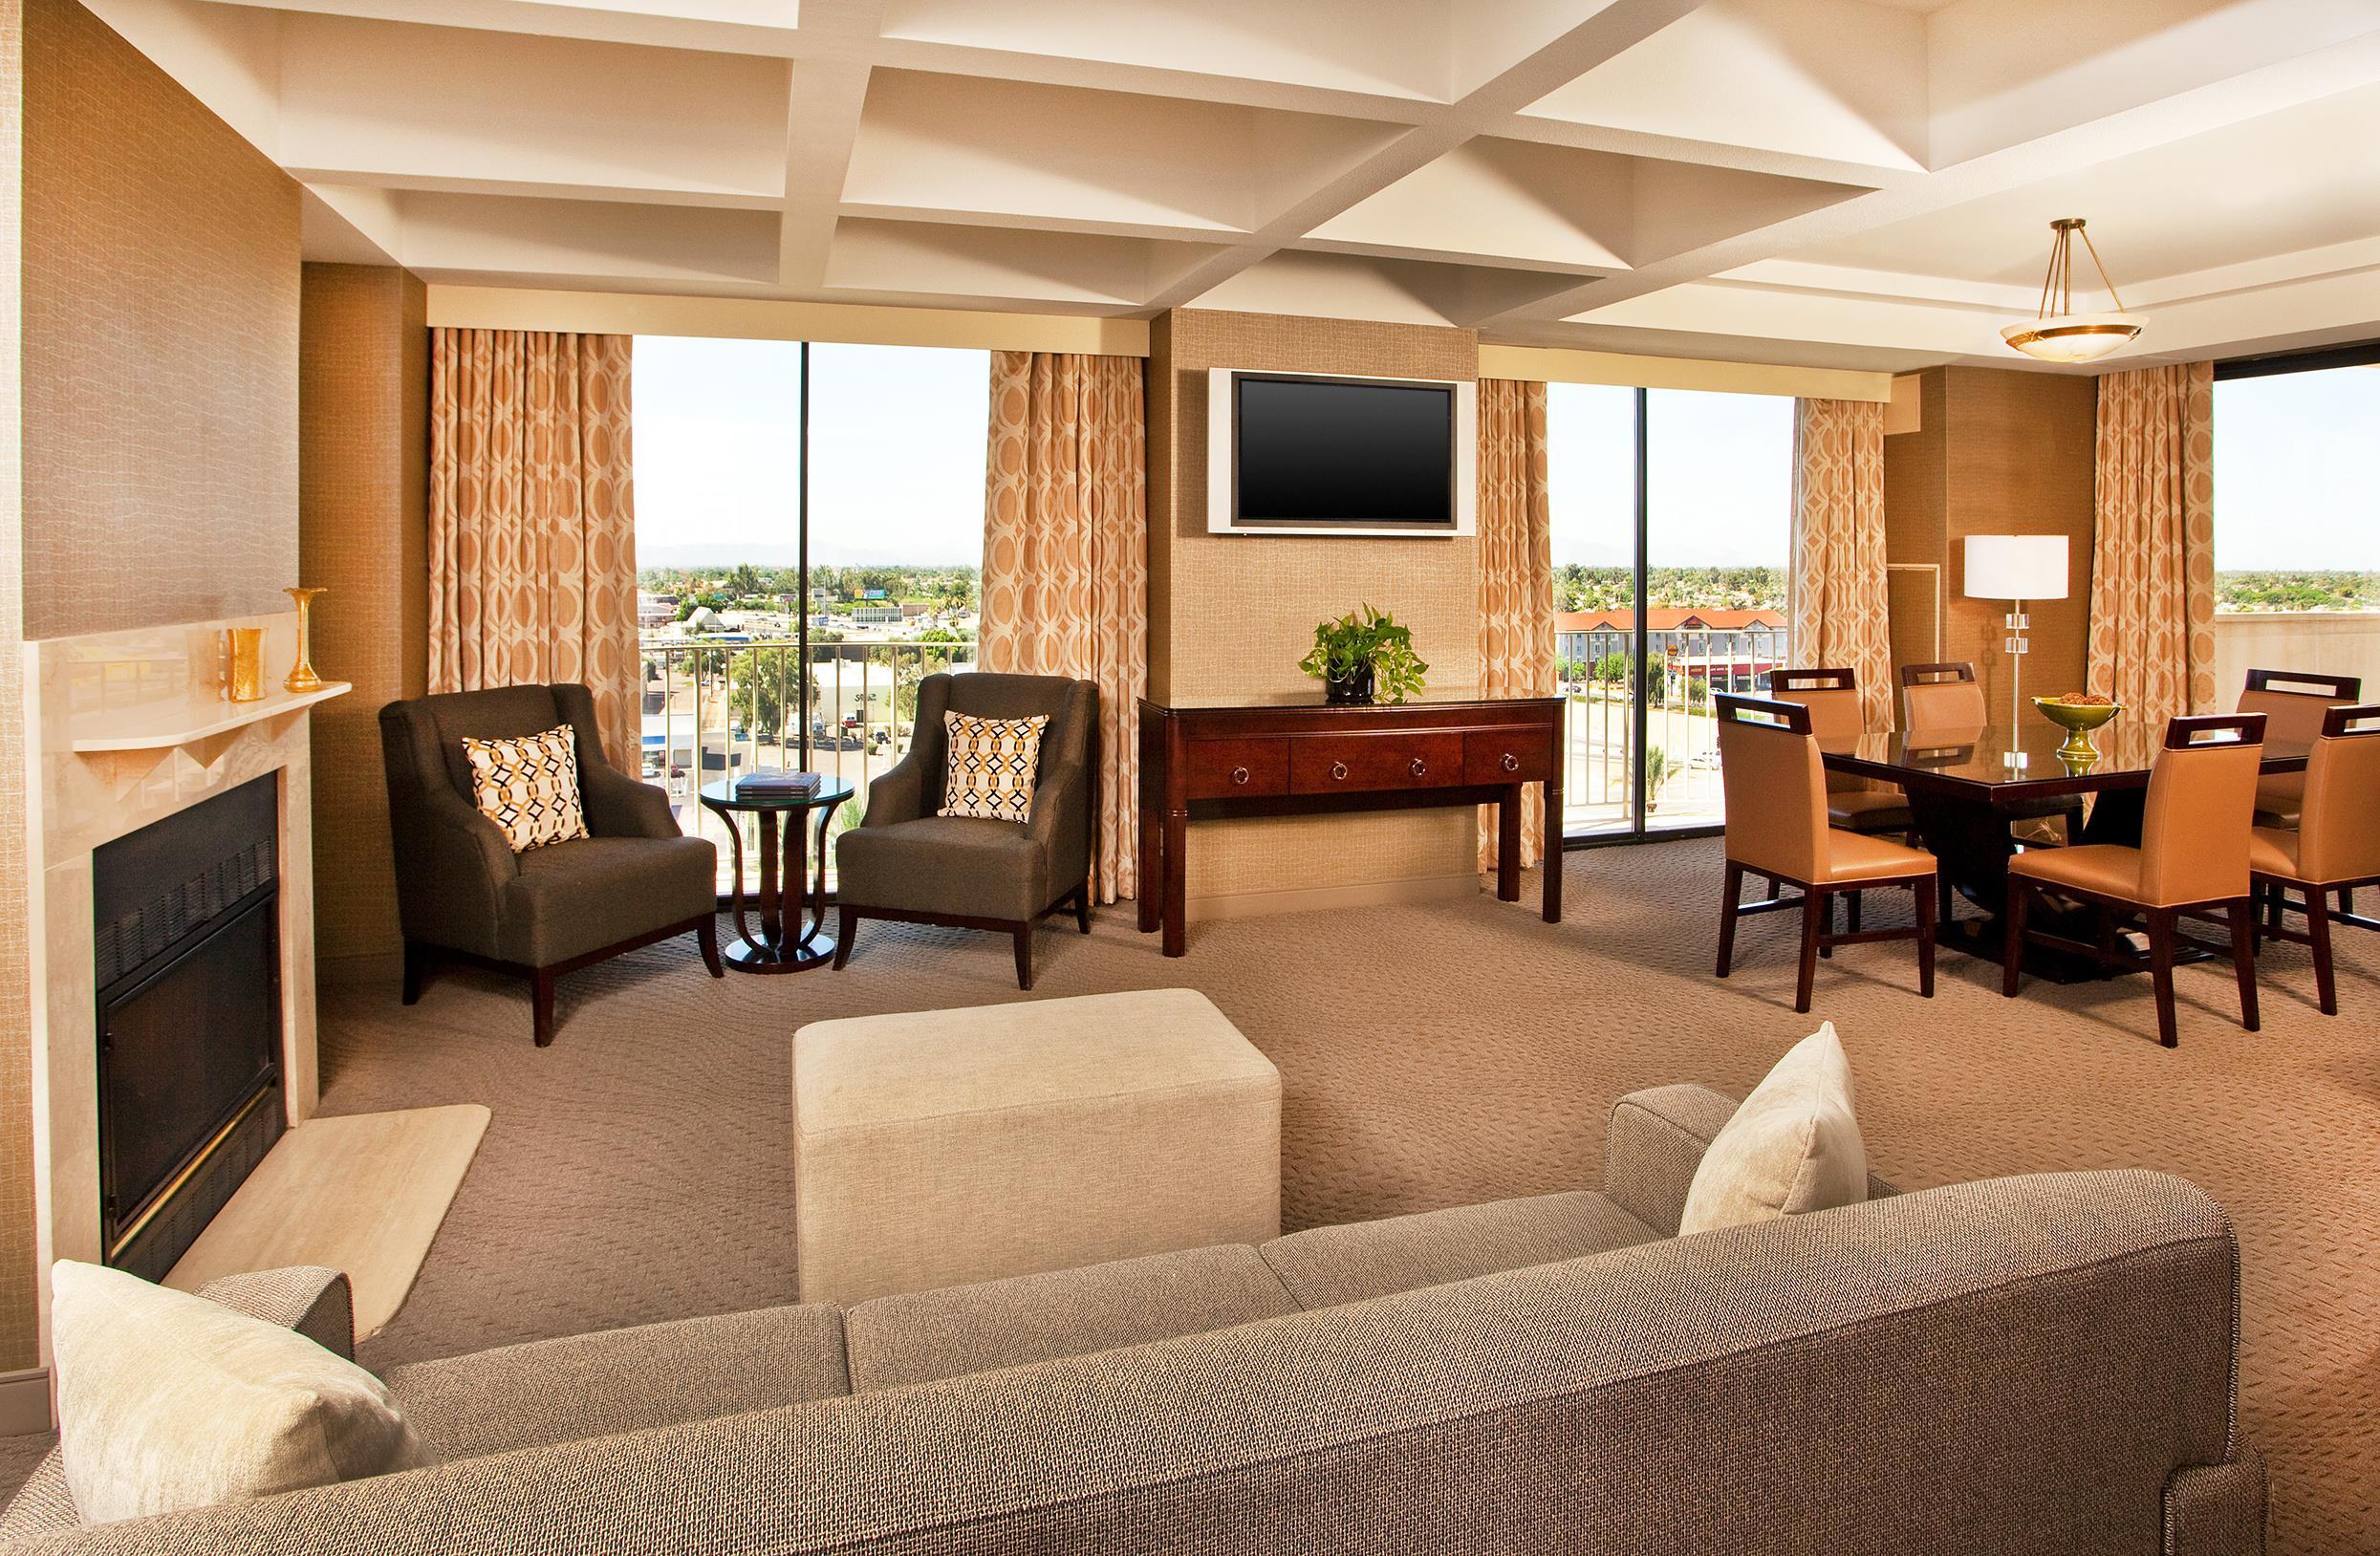 Sheraton Crescent Hotel image 26